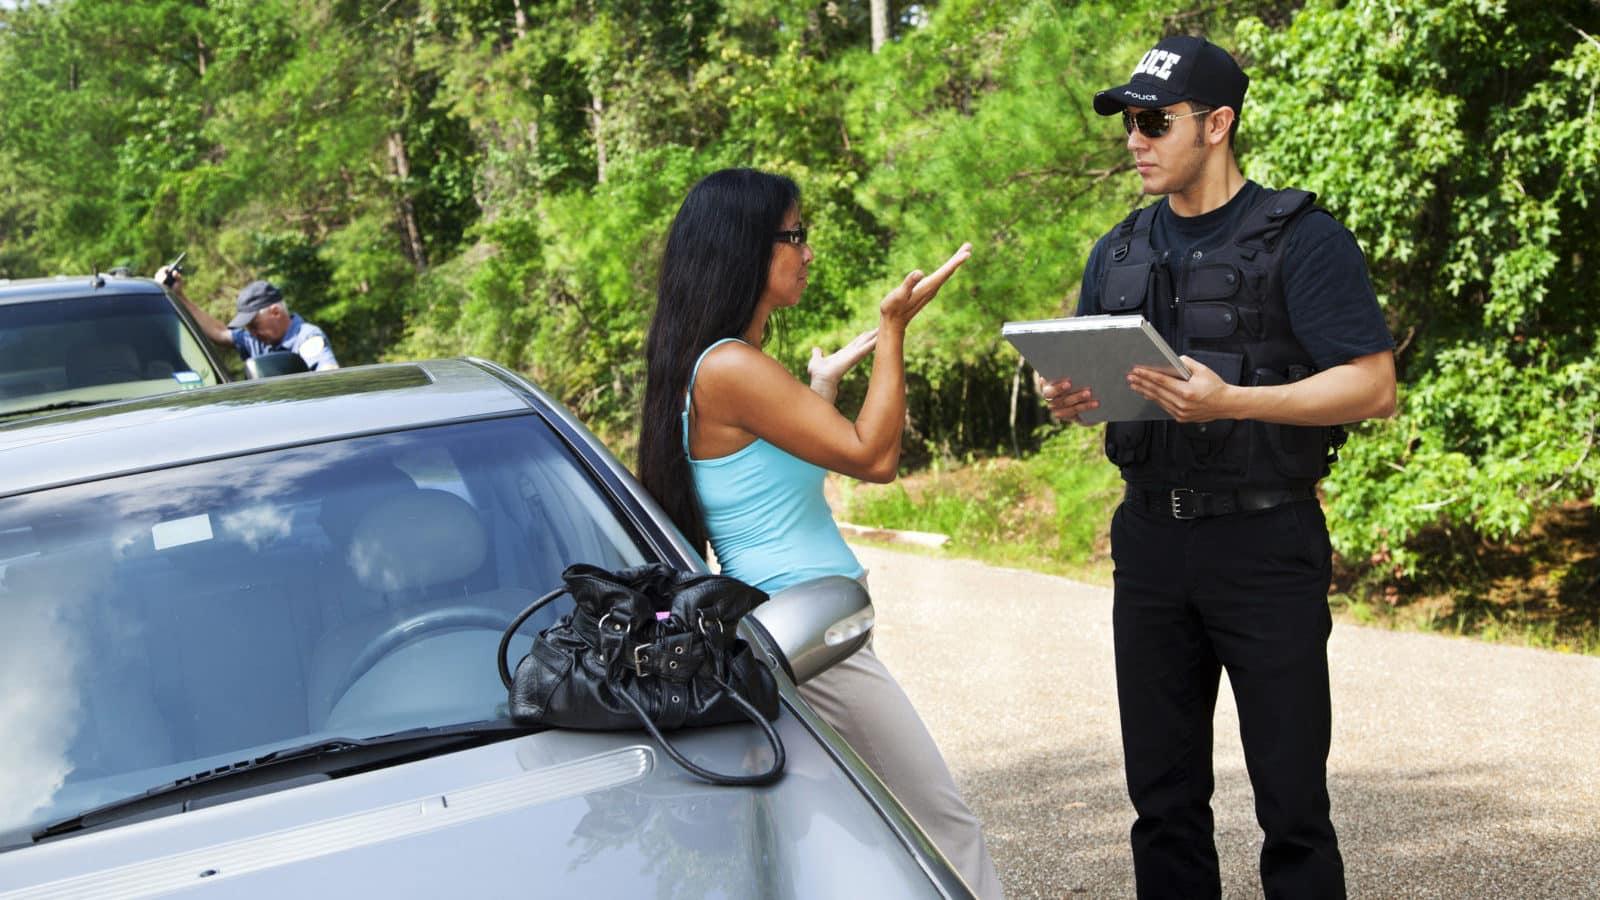 Policeman makes traffic stop. Woman explaining.